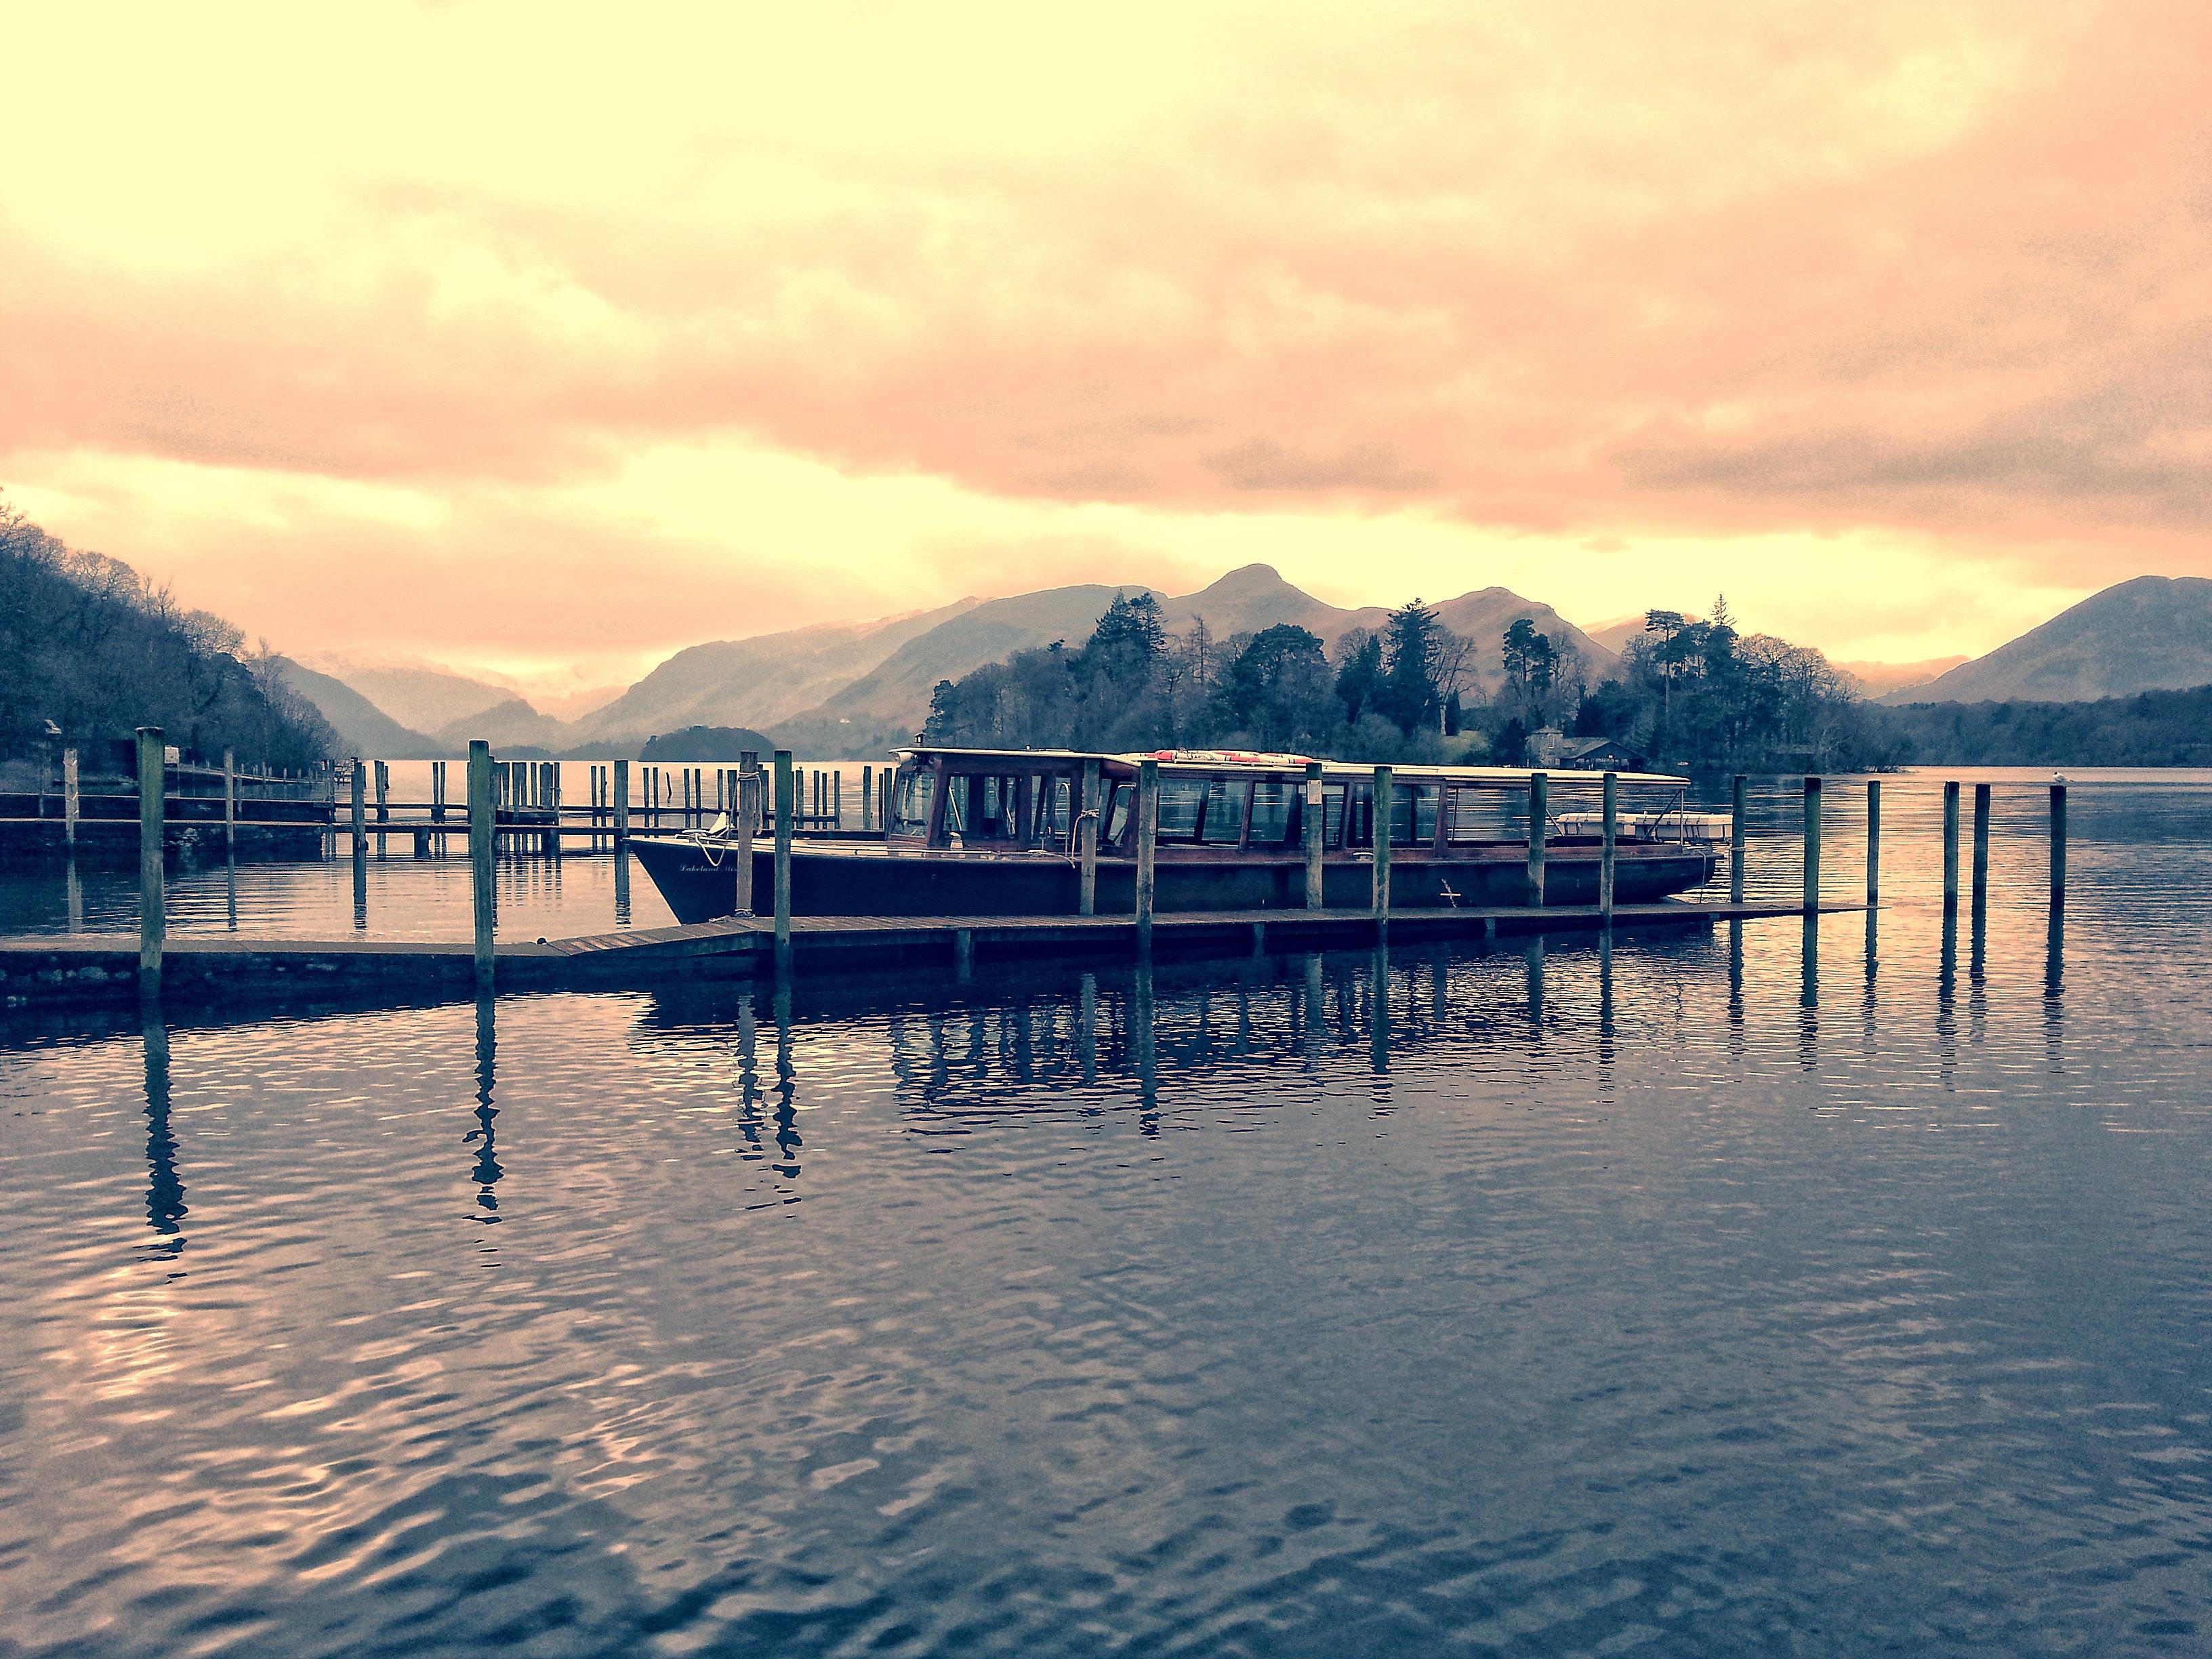 Boat beside dock during golden hour photo